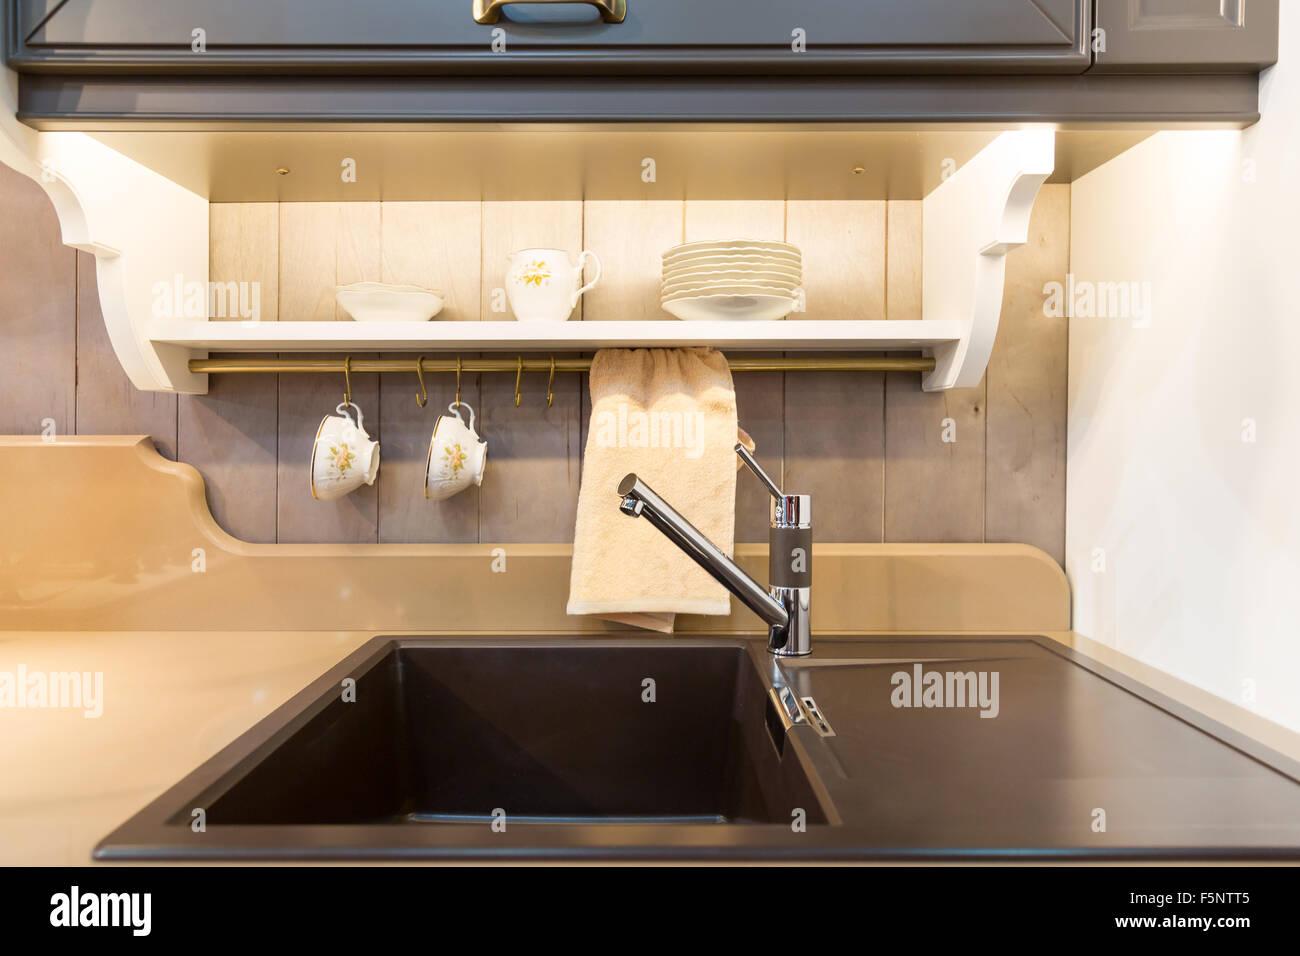 Modern Kitchen Sink In Black Ceramic Closeup Stock Photo 89605605